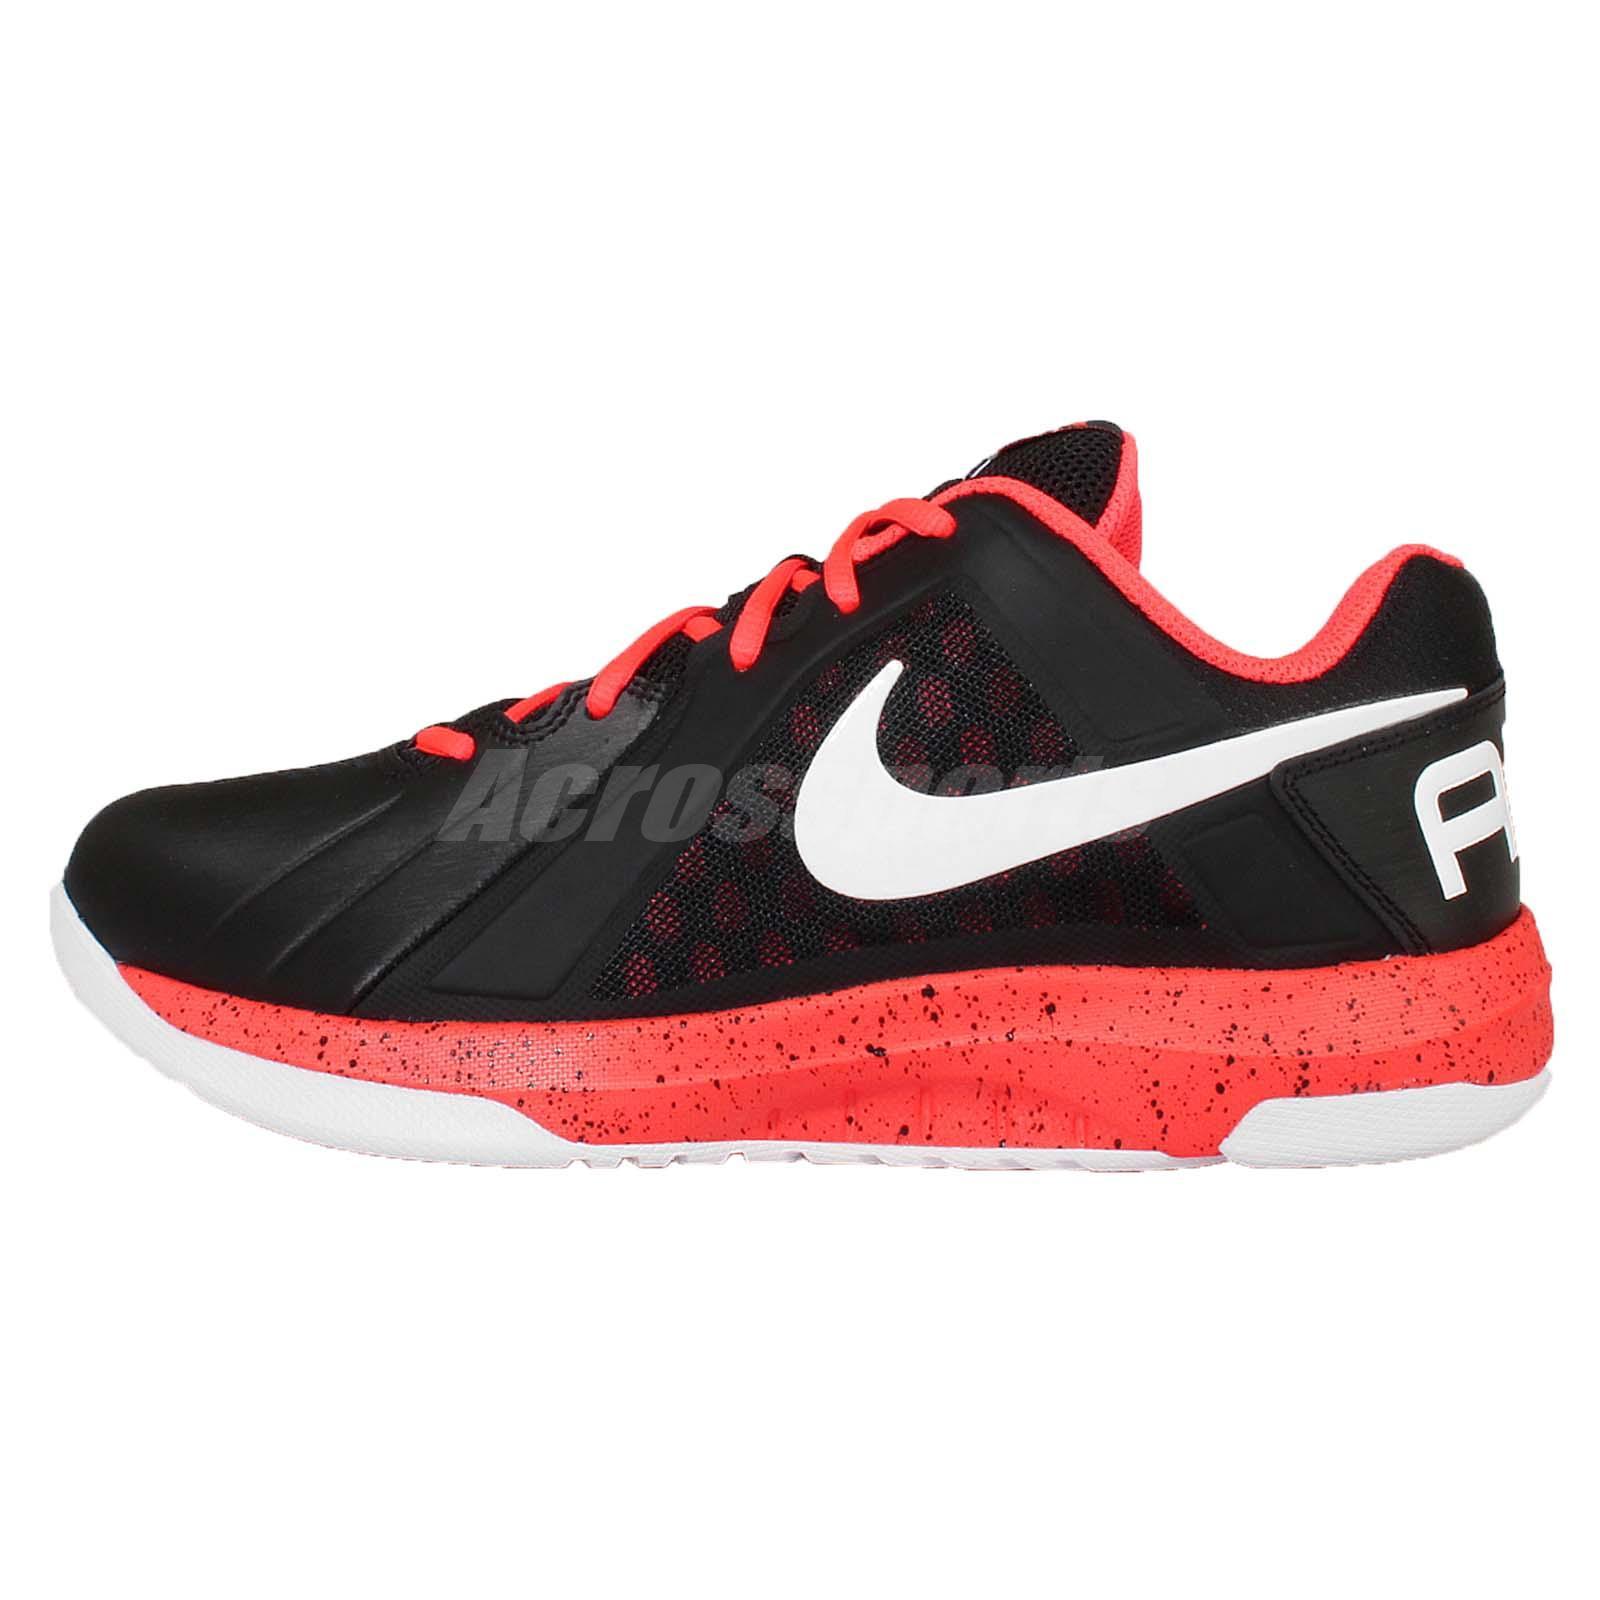 Nike Air Mavin Low Basketball Shoes